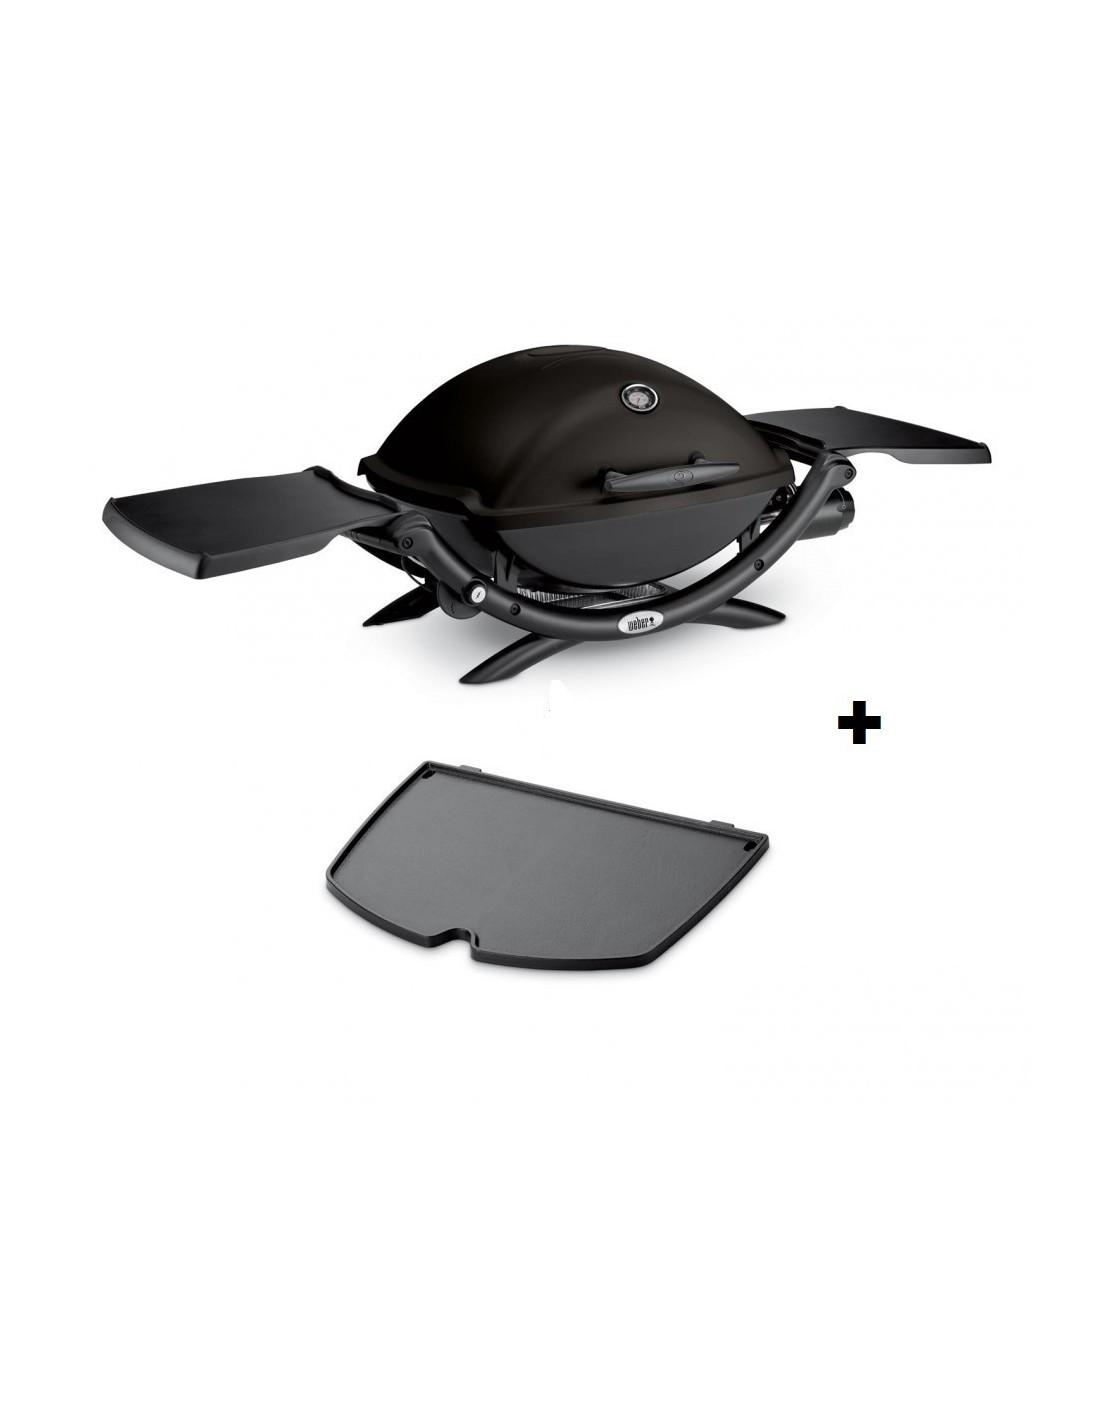 barbecue gaz q 2200 noir avec plancha 6559 weber